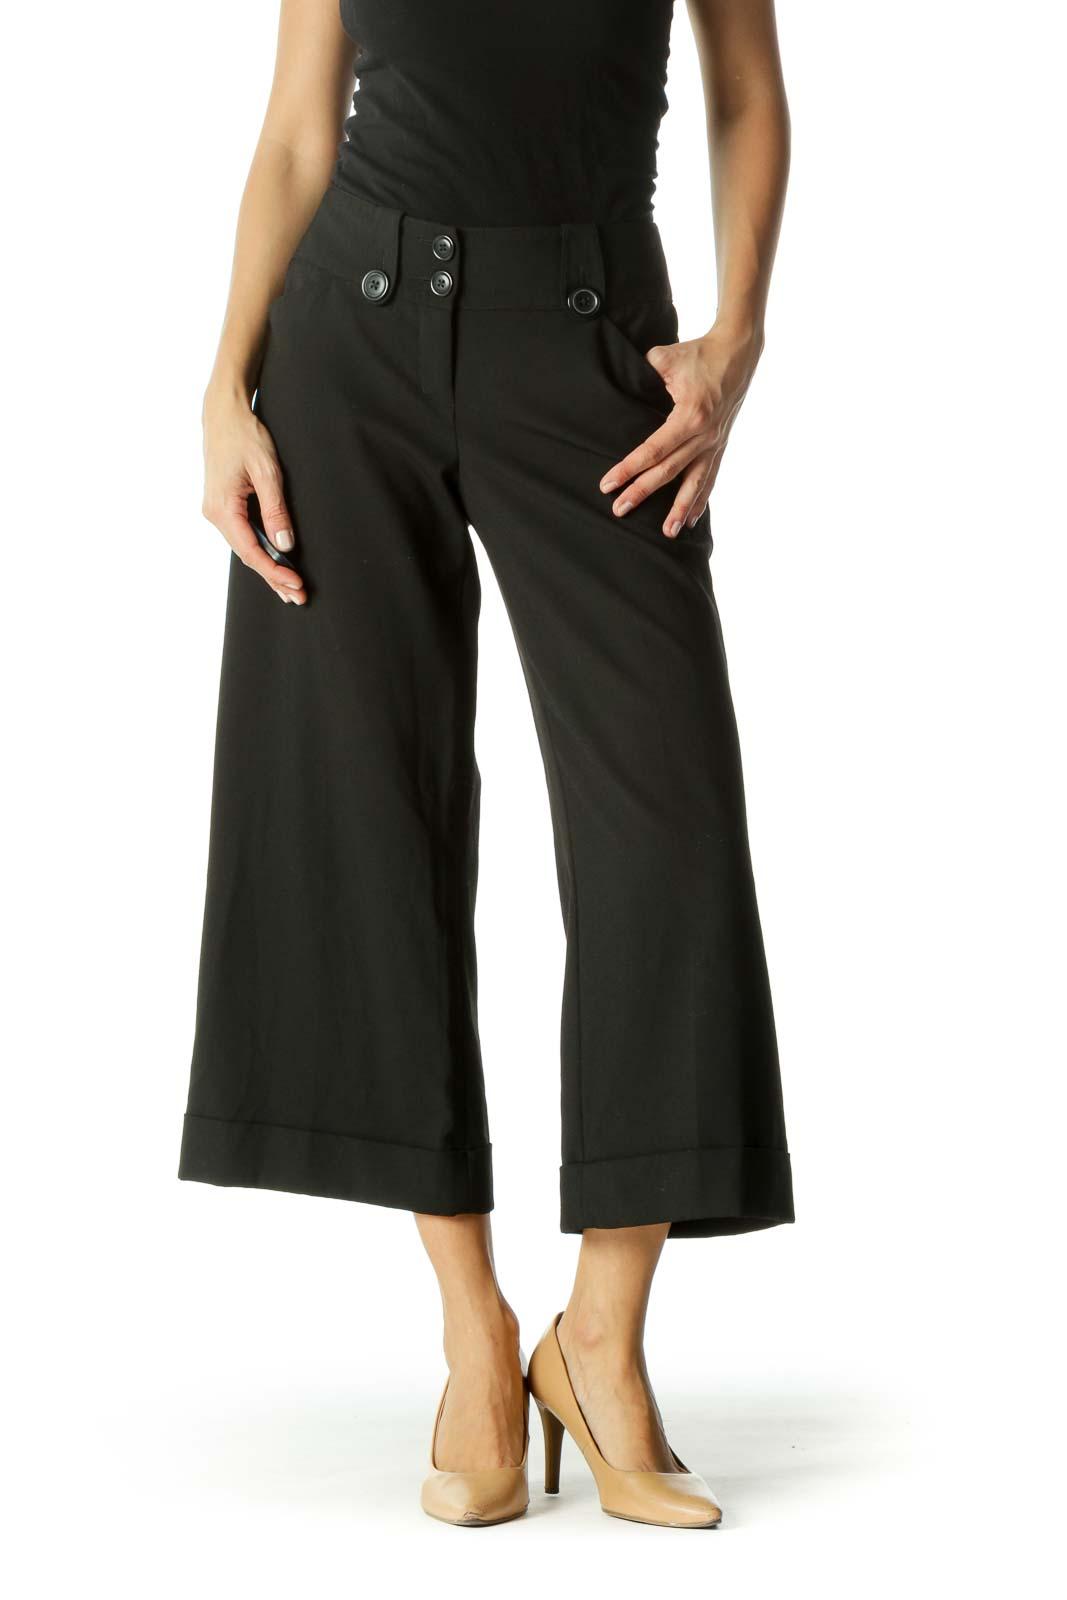 Black Pocketed Belt-Hoops Culottes Pants